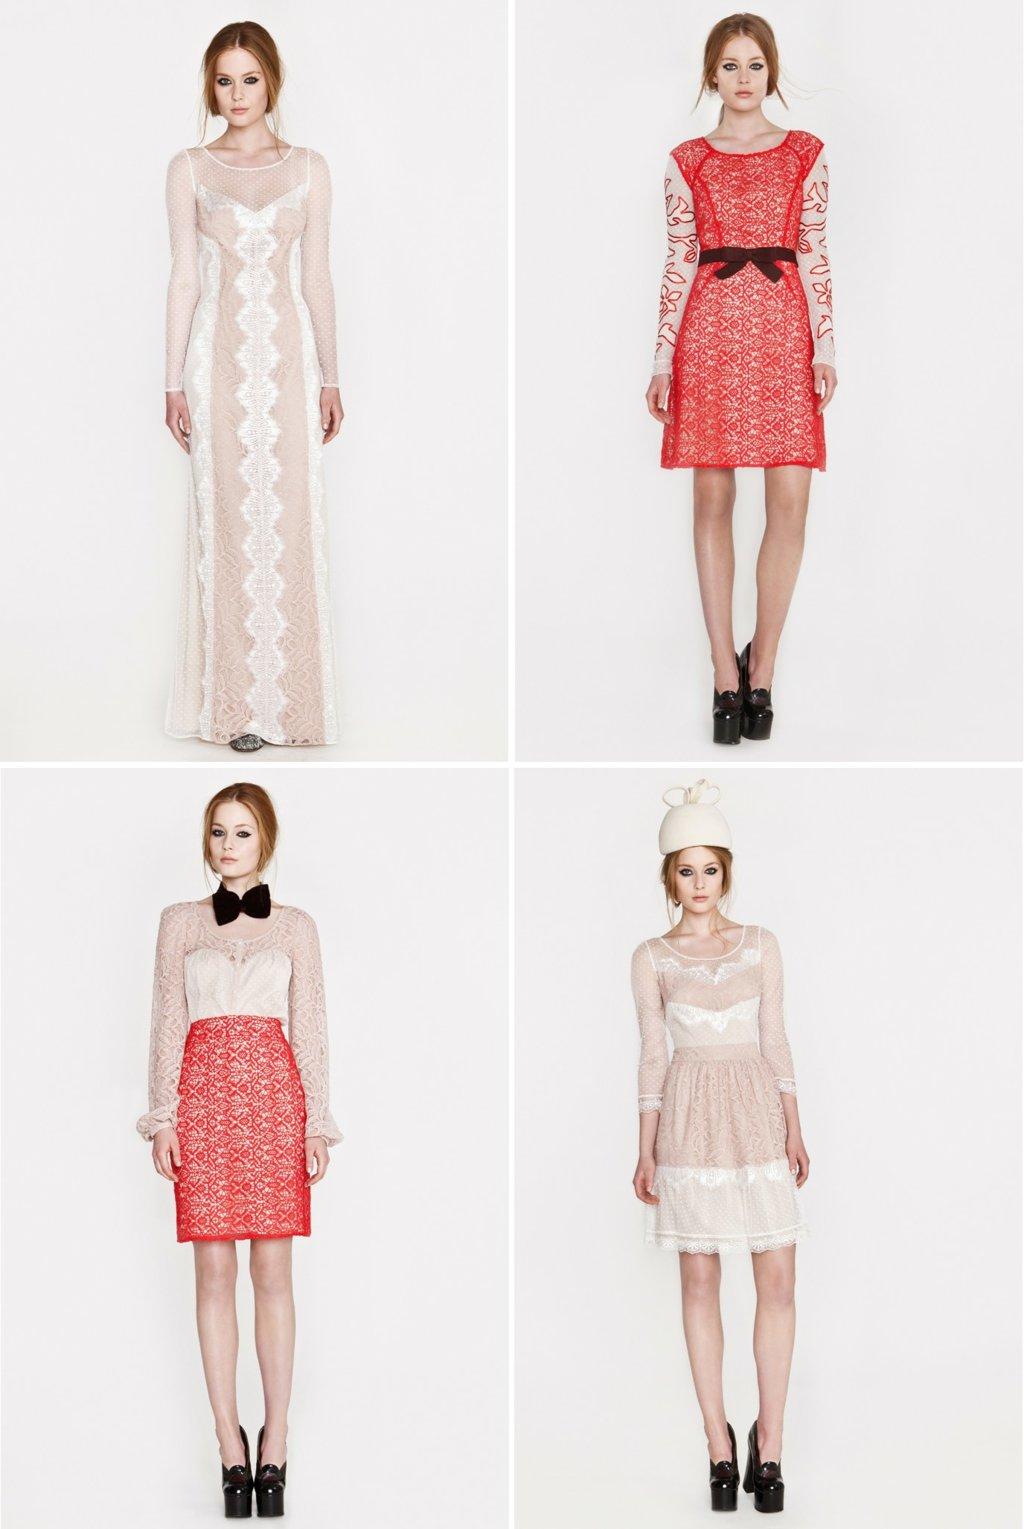 Alice temperley wedding dress inspiration resort 2013 dresses for Alice temperley wedding dresses